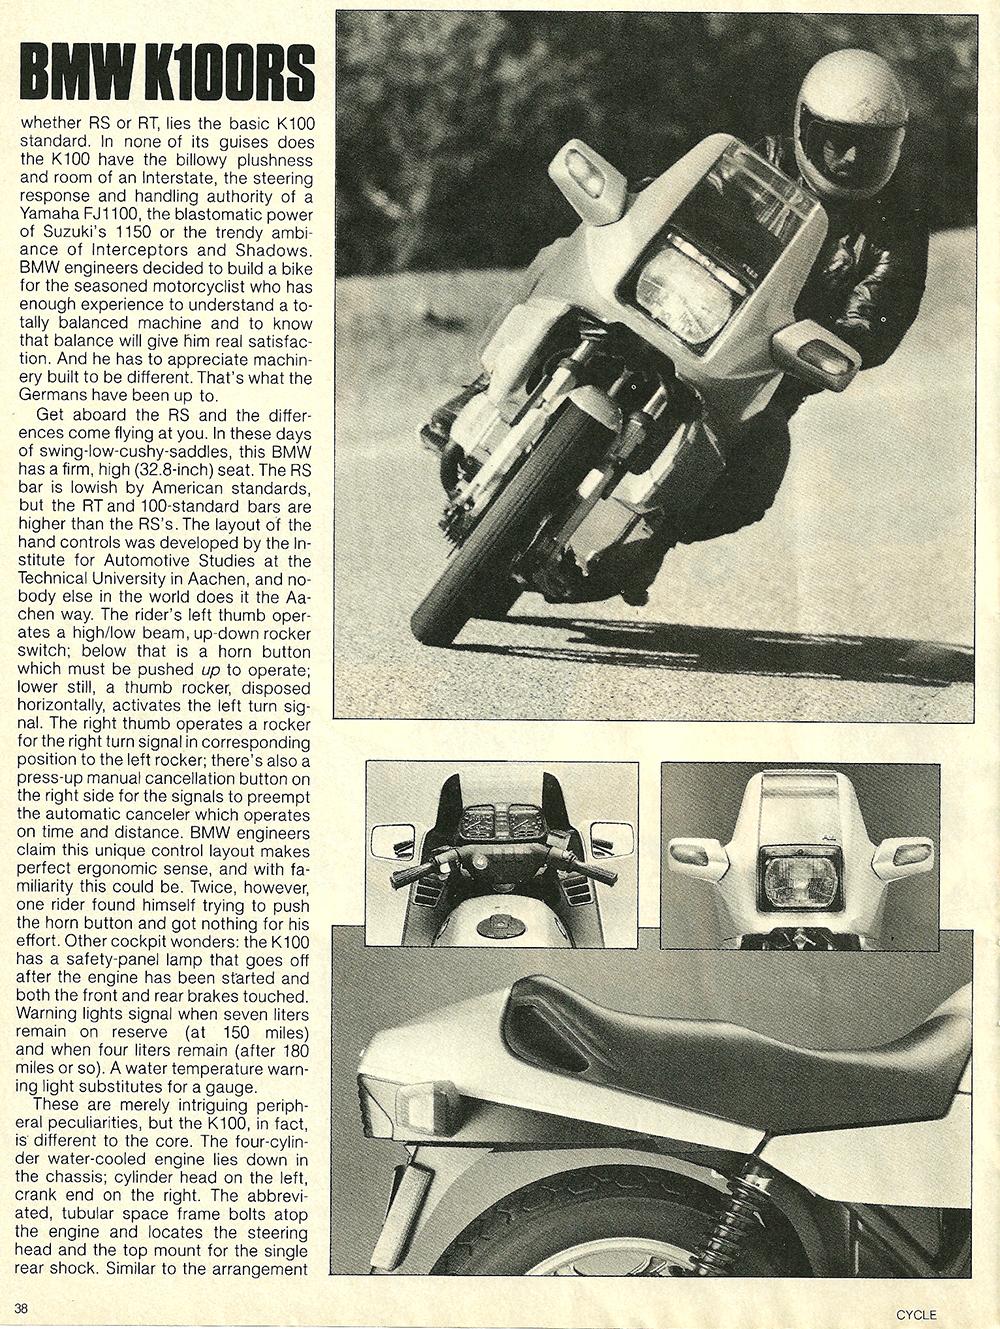 1984 BMW K100RS road test 03.jpg